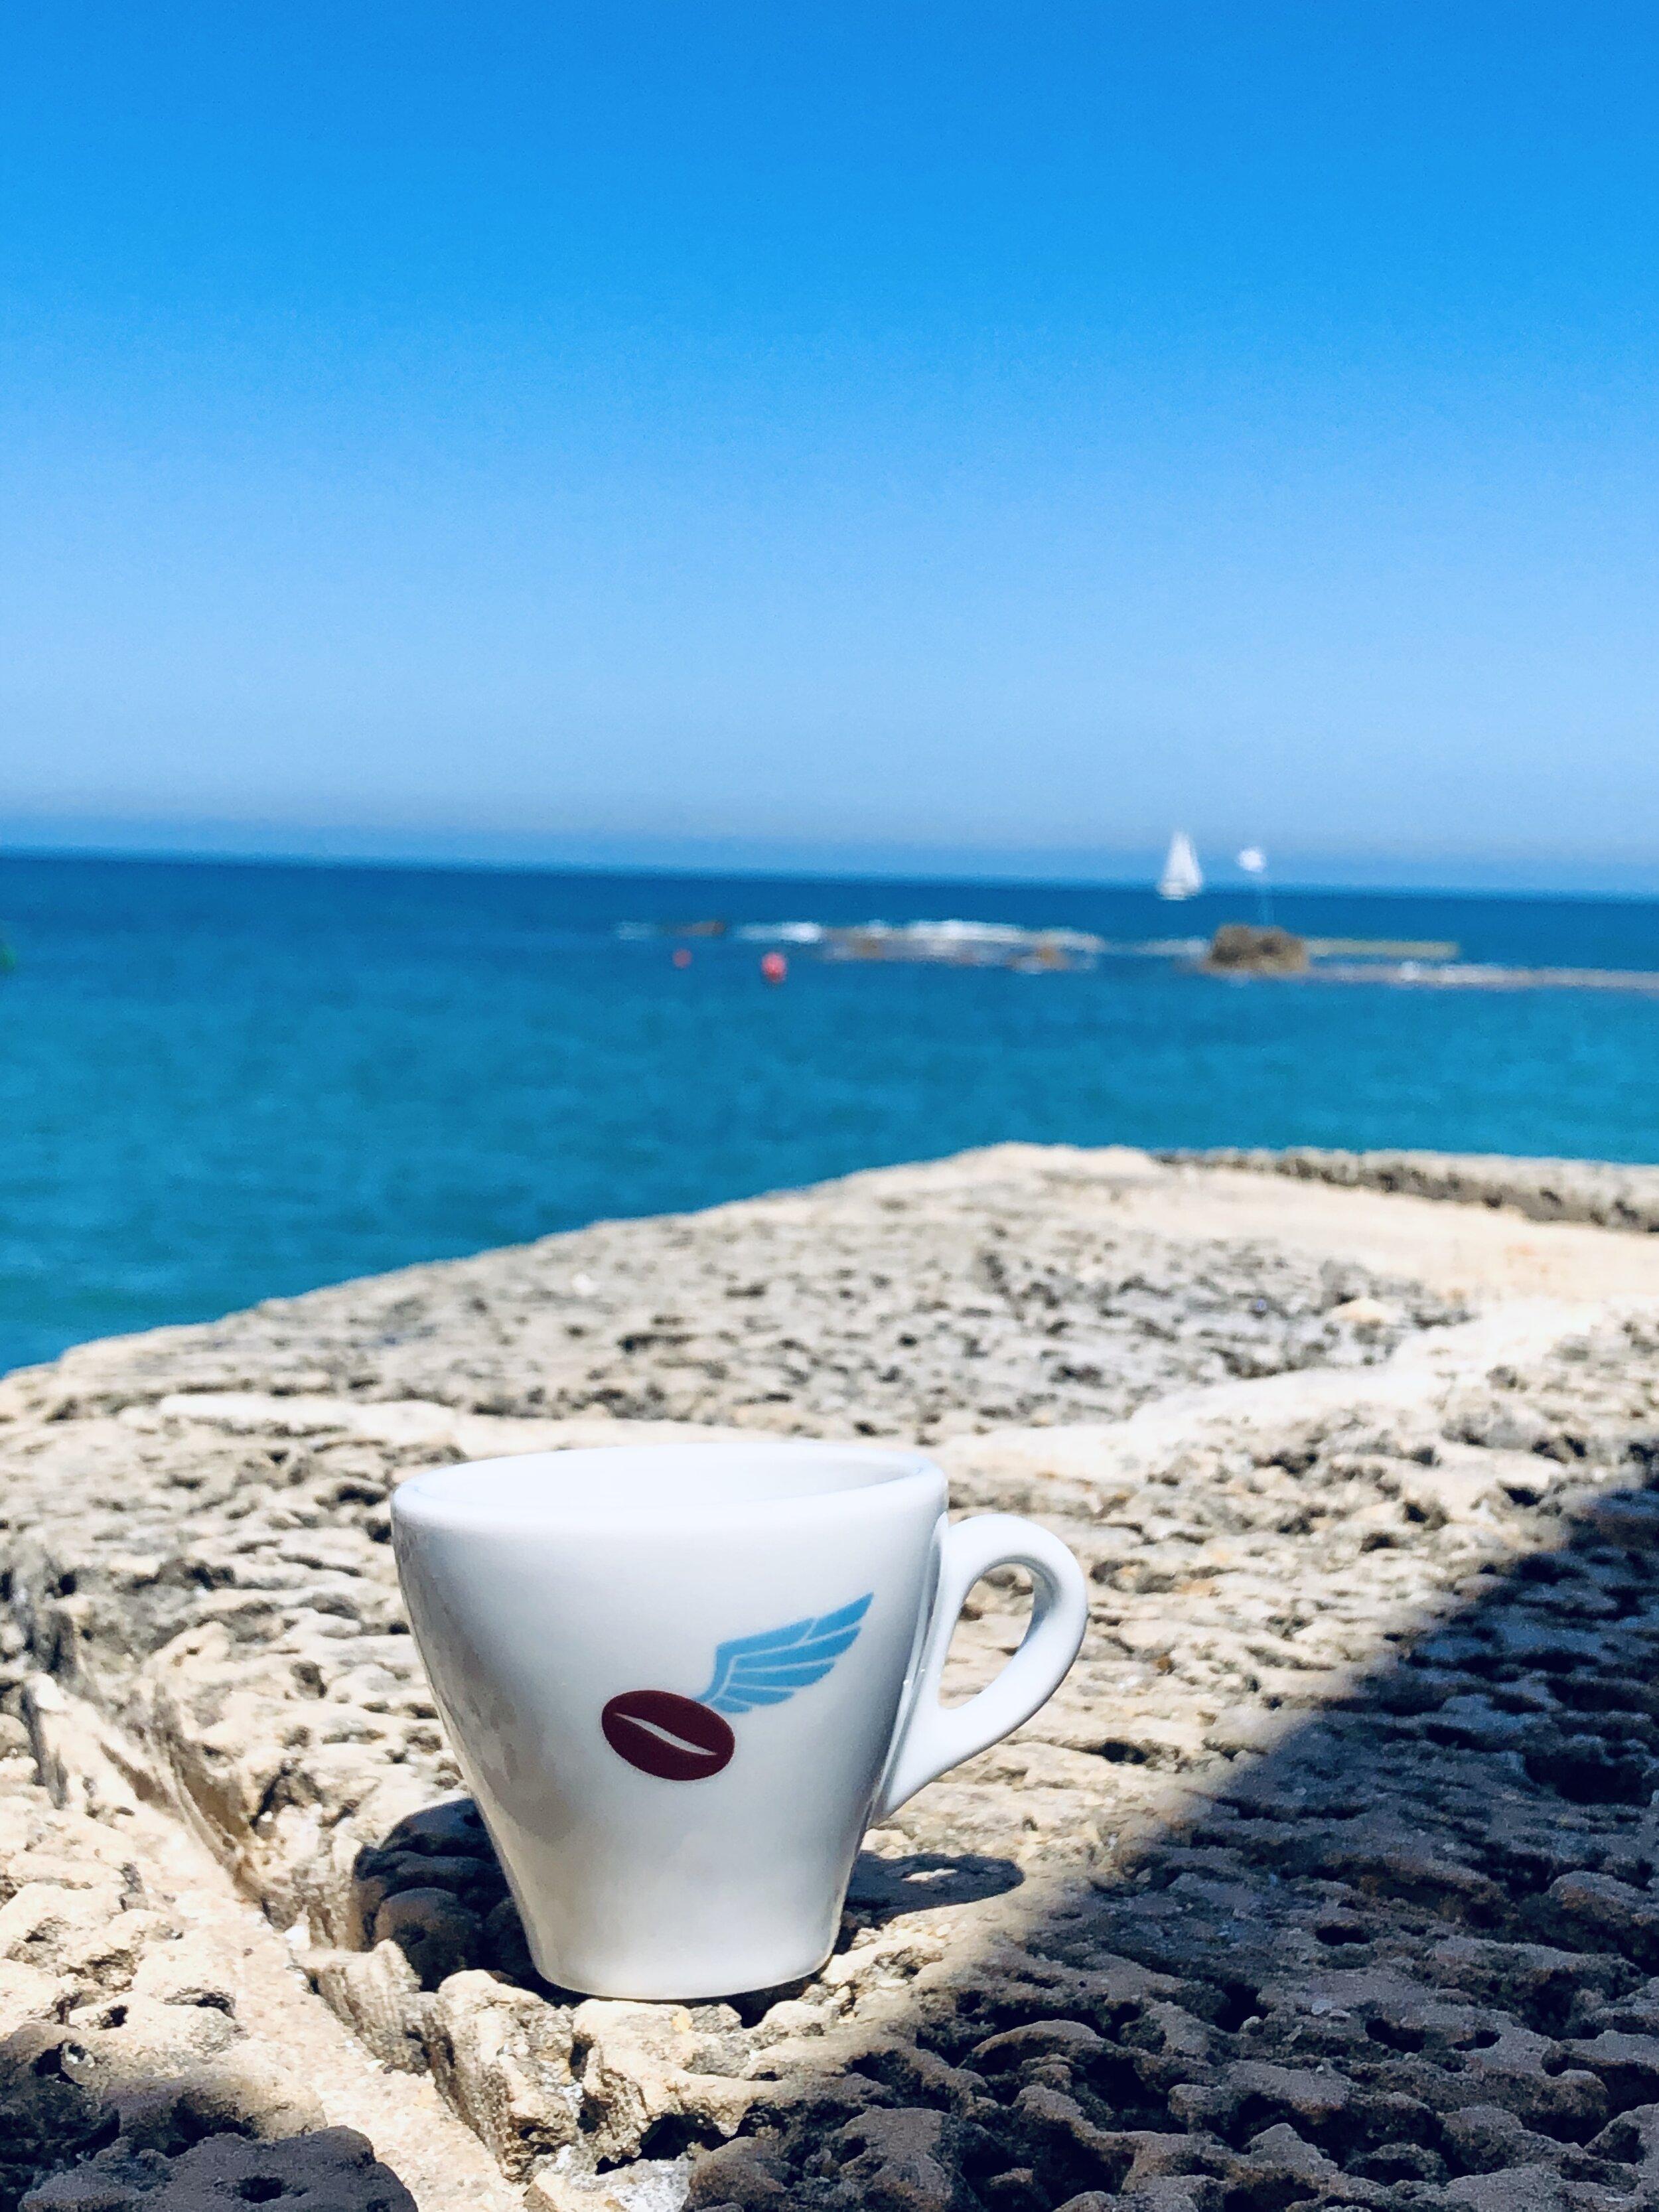 Warum schmeckt italienischer Kaffee so gut? — Beans ...